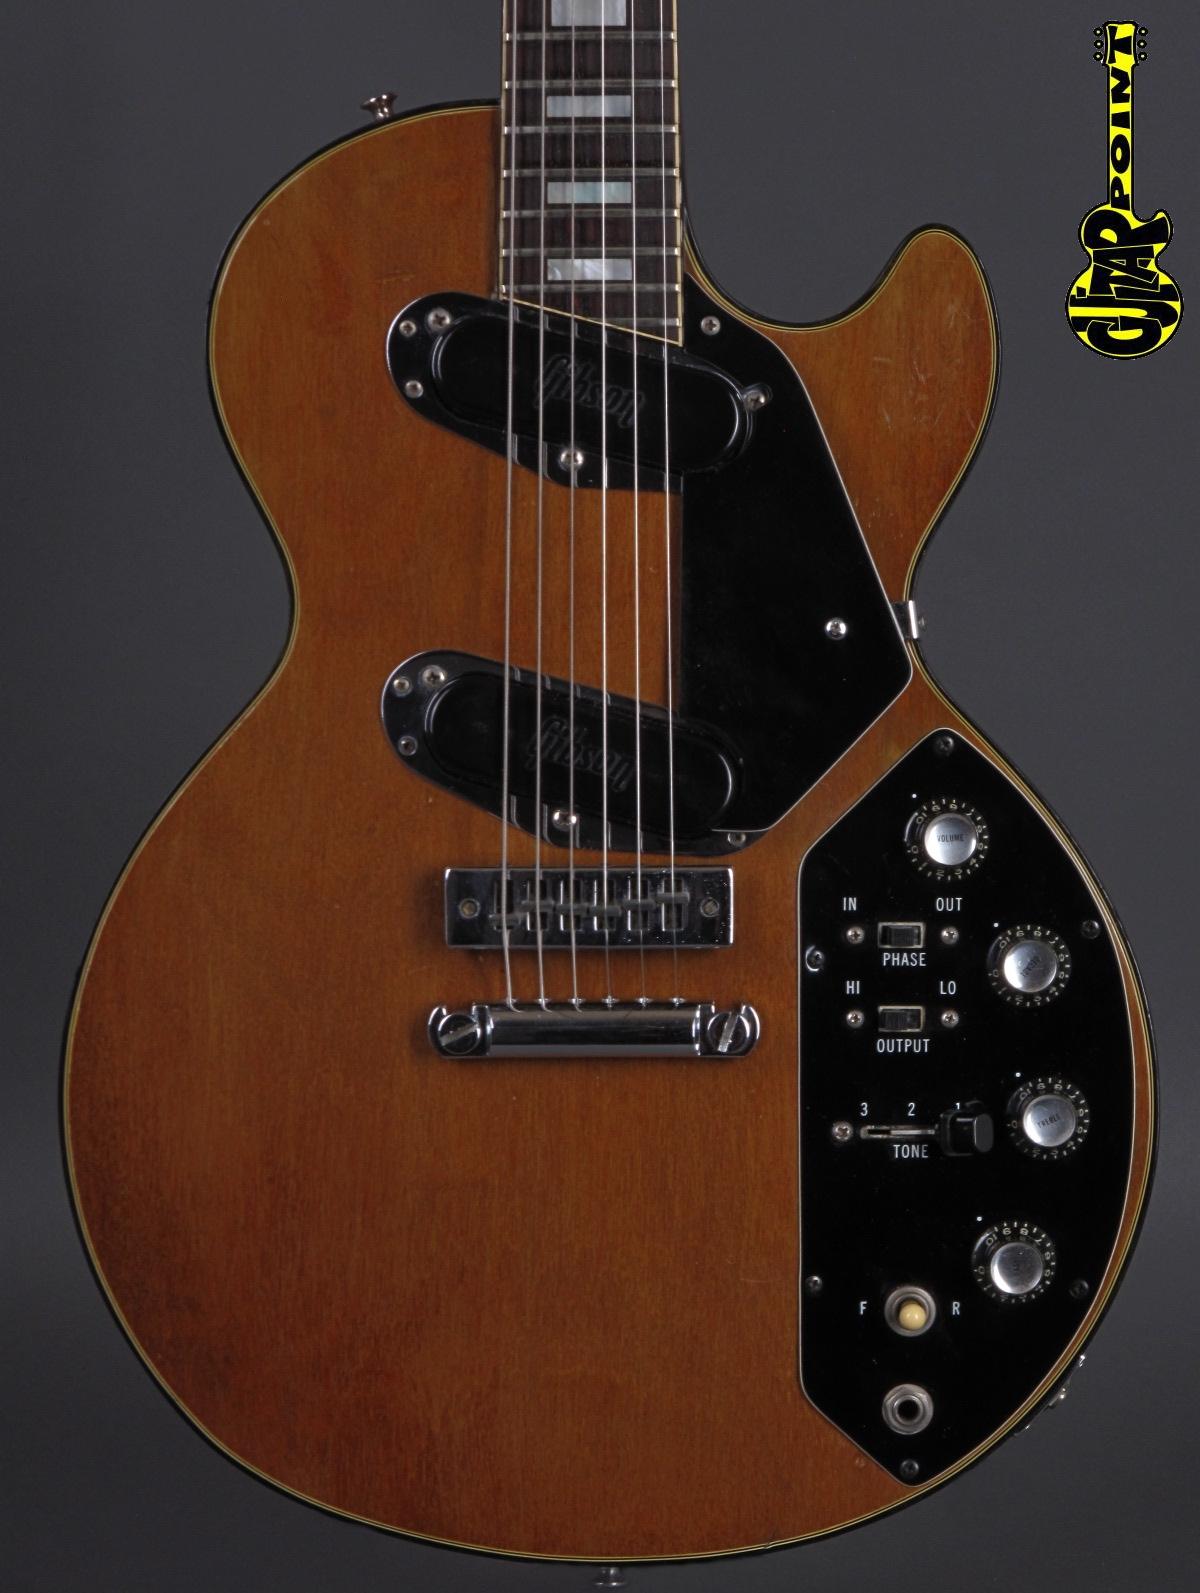 1973 Gibson Les Paul Recording - Natural